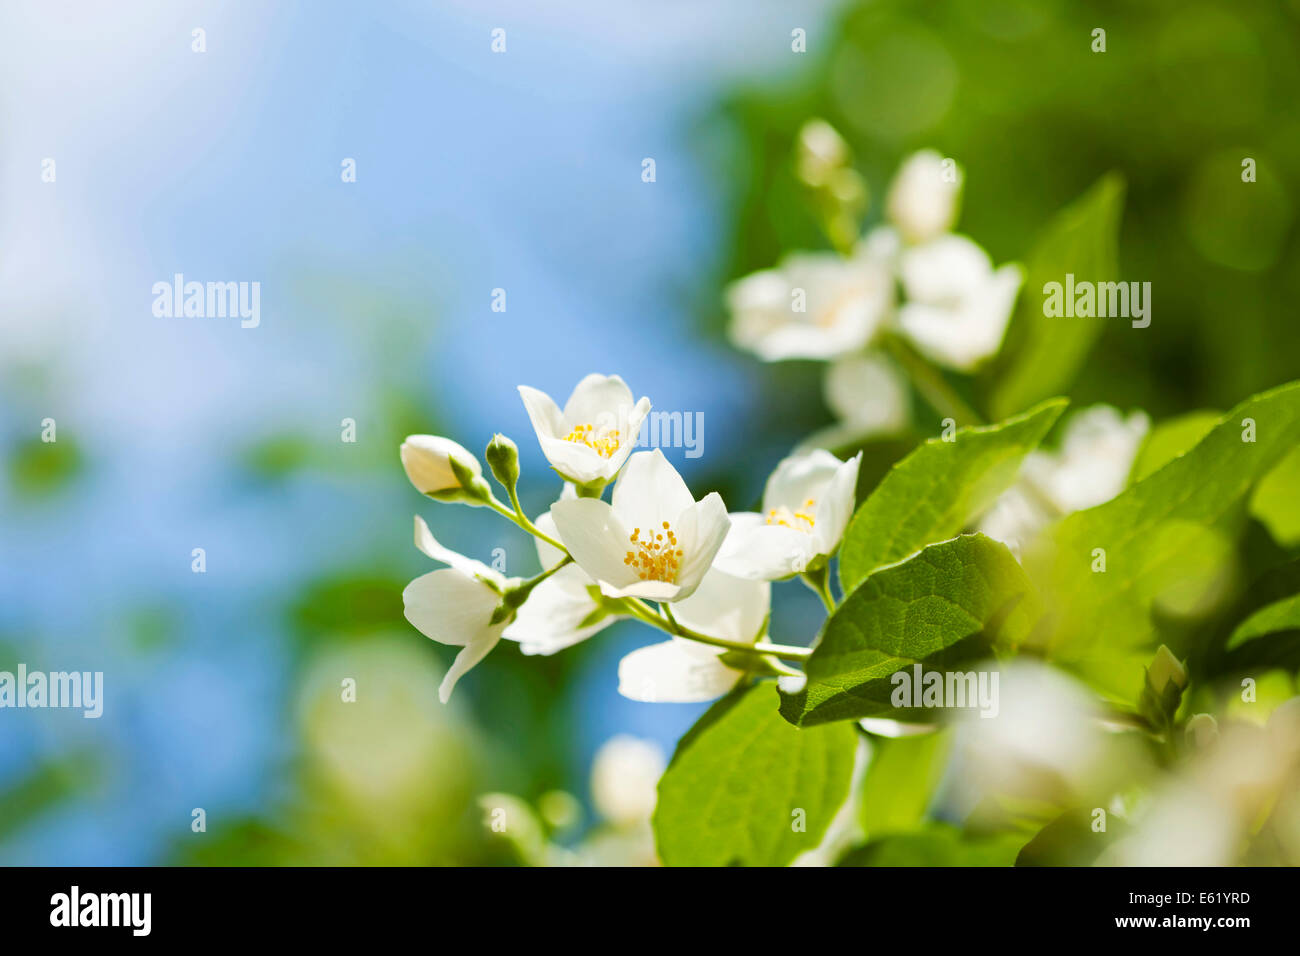 Schönen frischen Jasminblüten in den Garten, Makro-Fotografie Stockbild